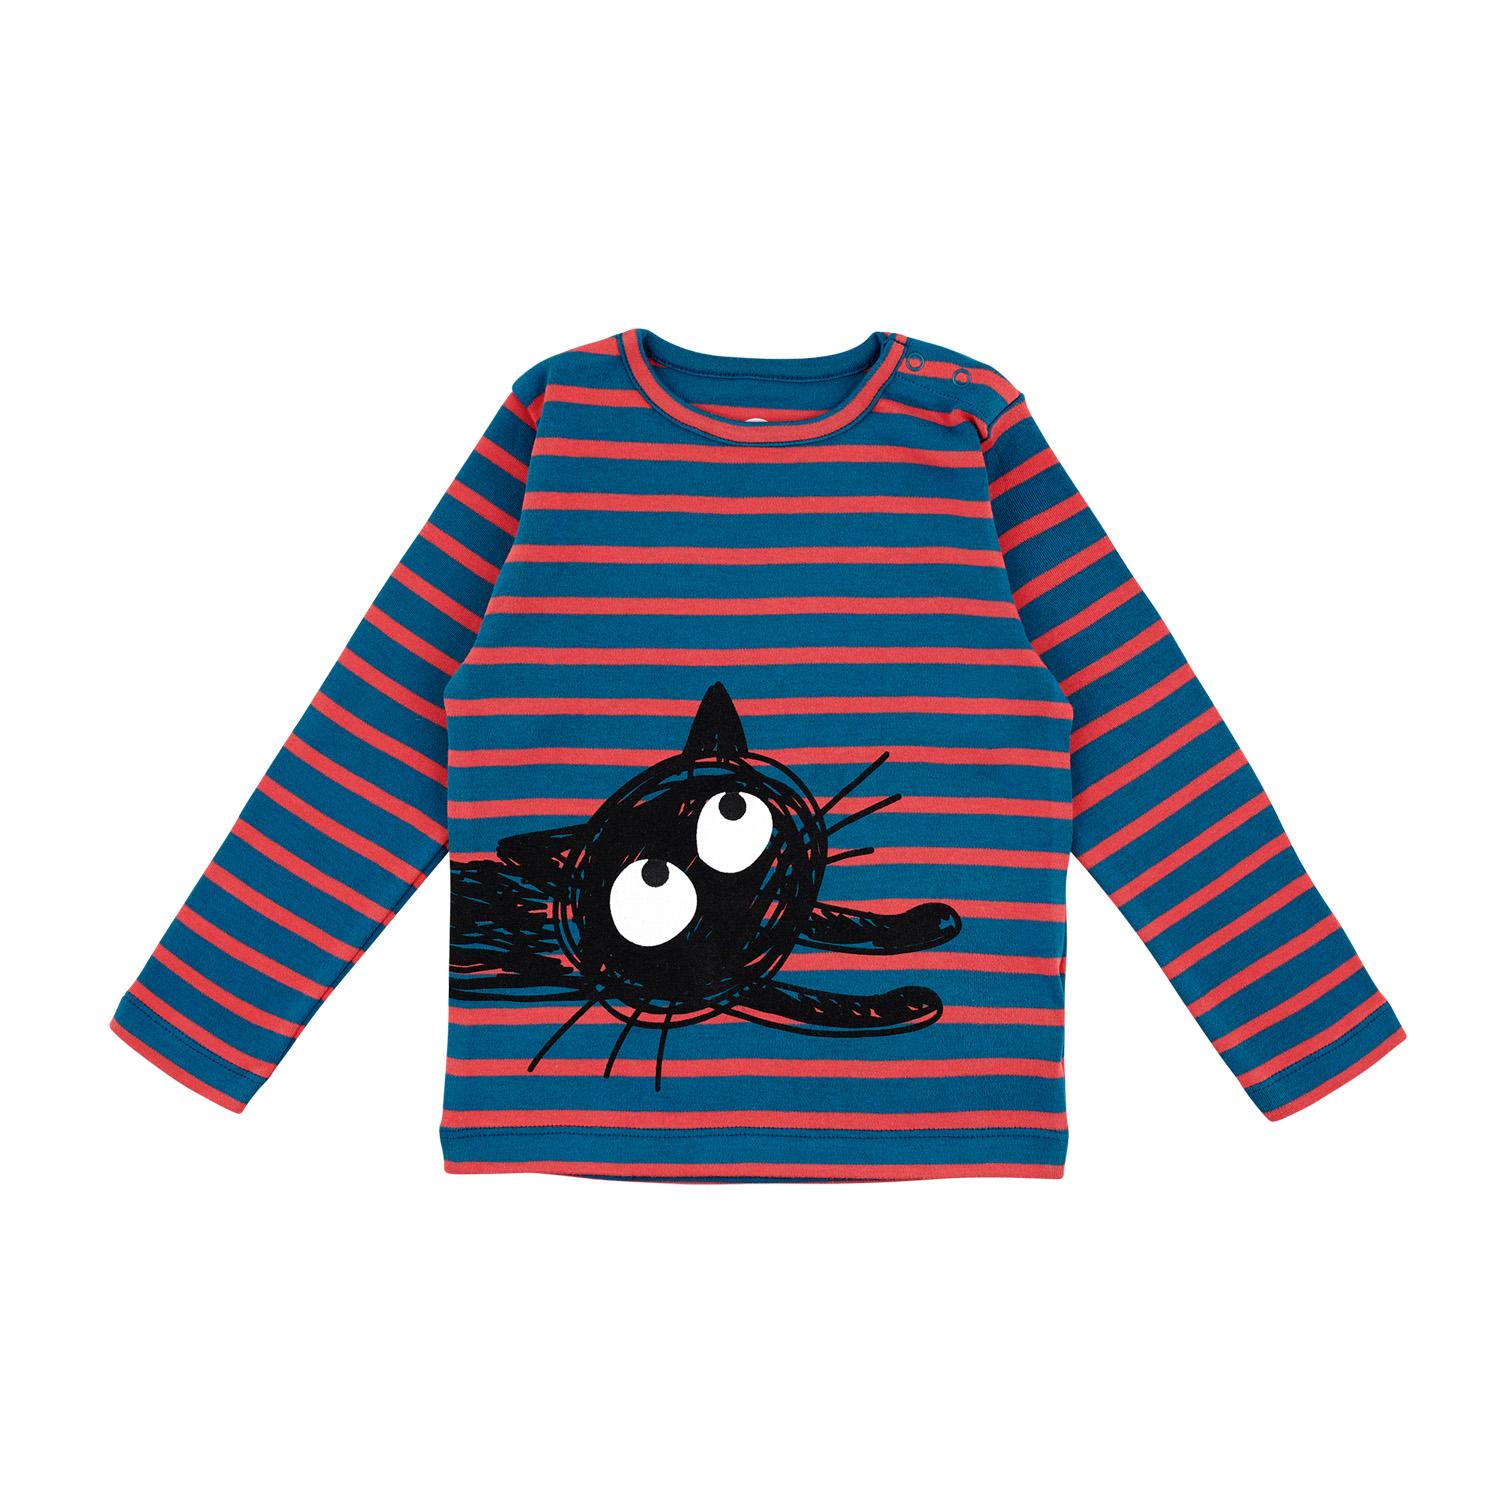 Barn t-shirt långärmad randig